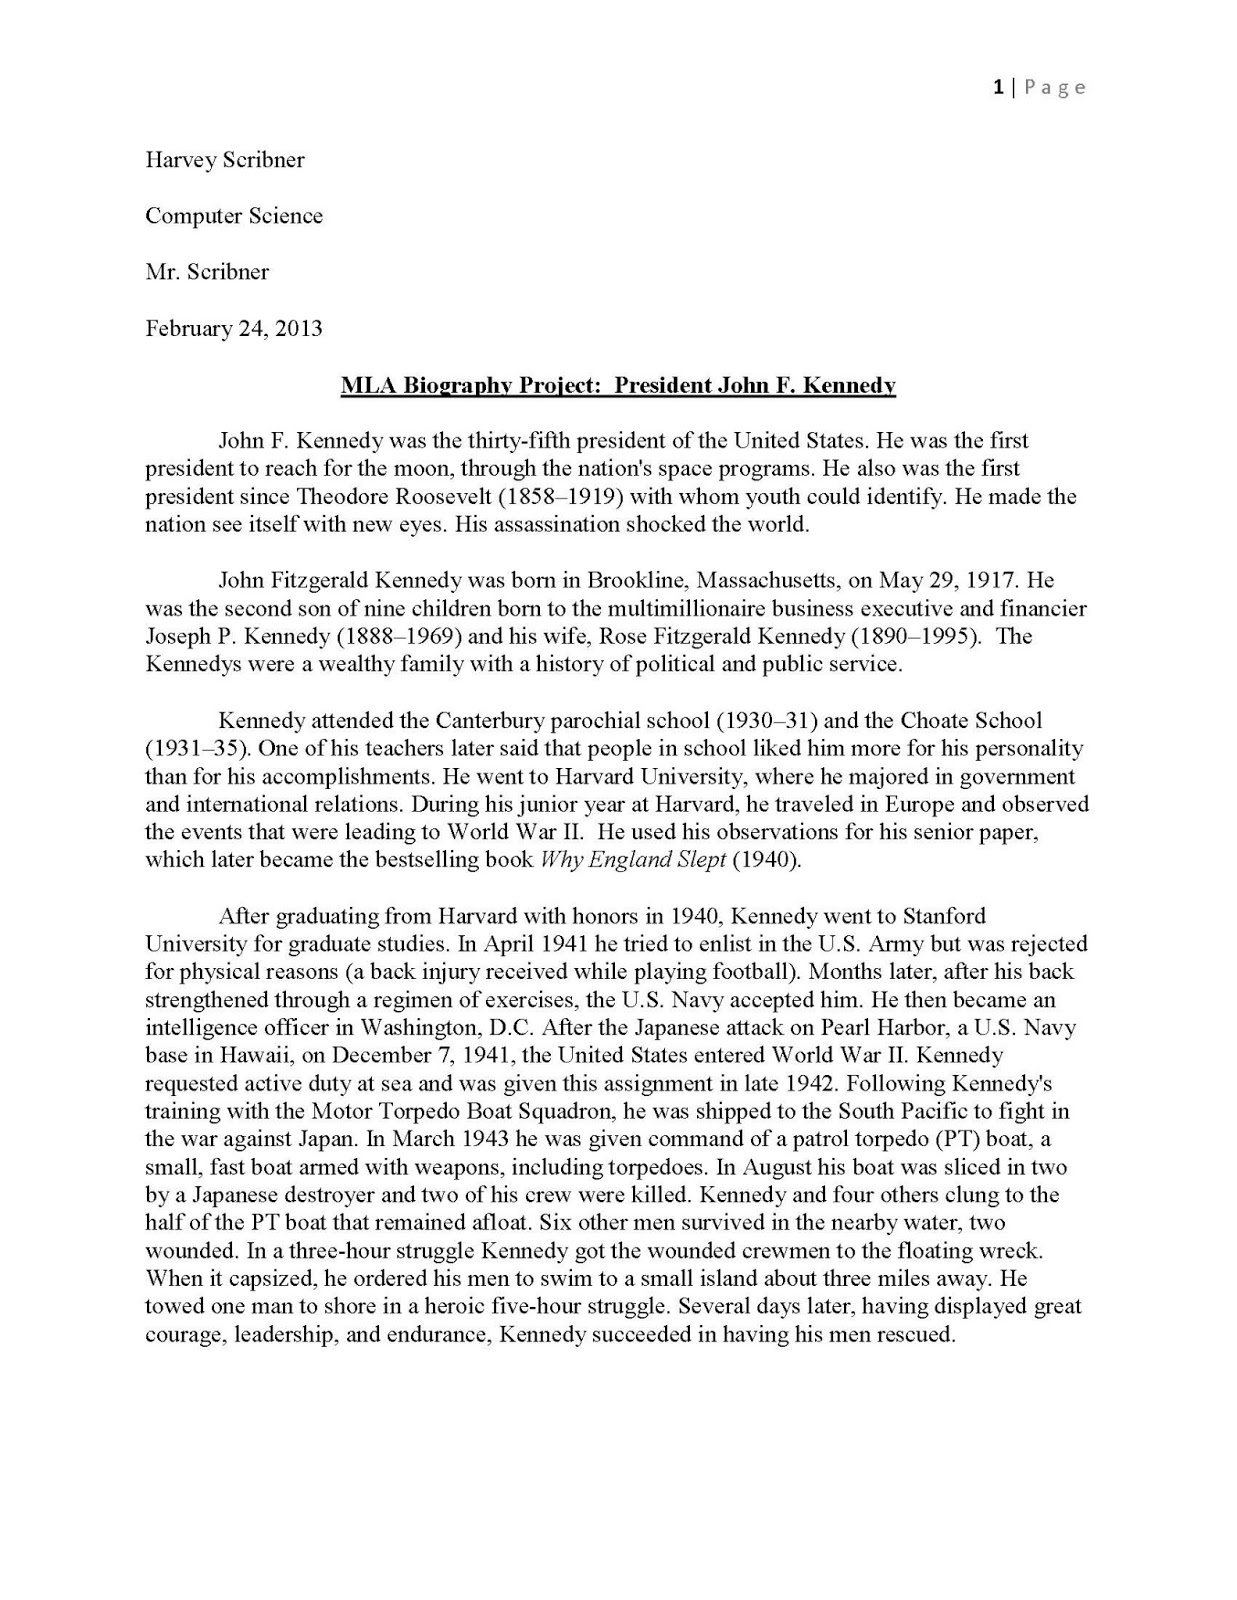 025 Essay Example Jfkmlashortformbiographyreportexample Page 1 Surprising Autobiography Sample Pdf For Highschool Students Full